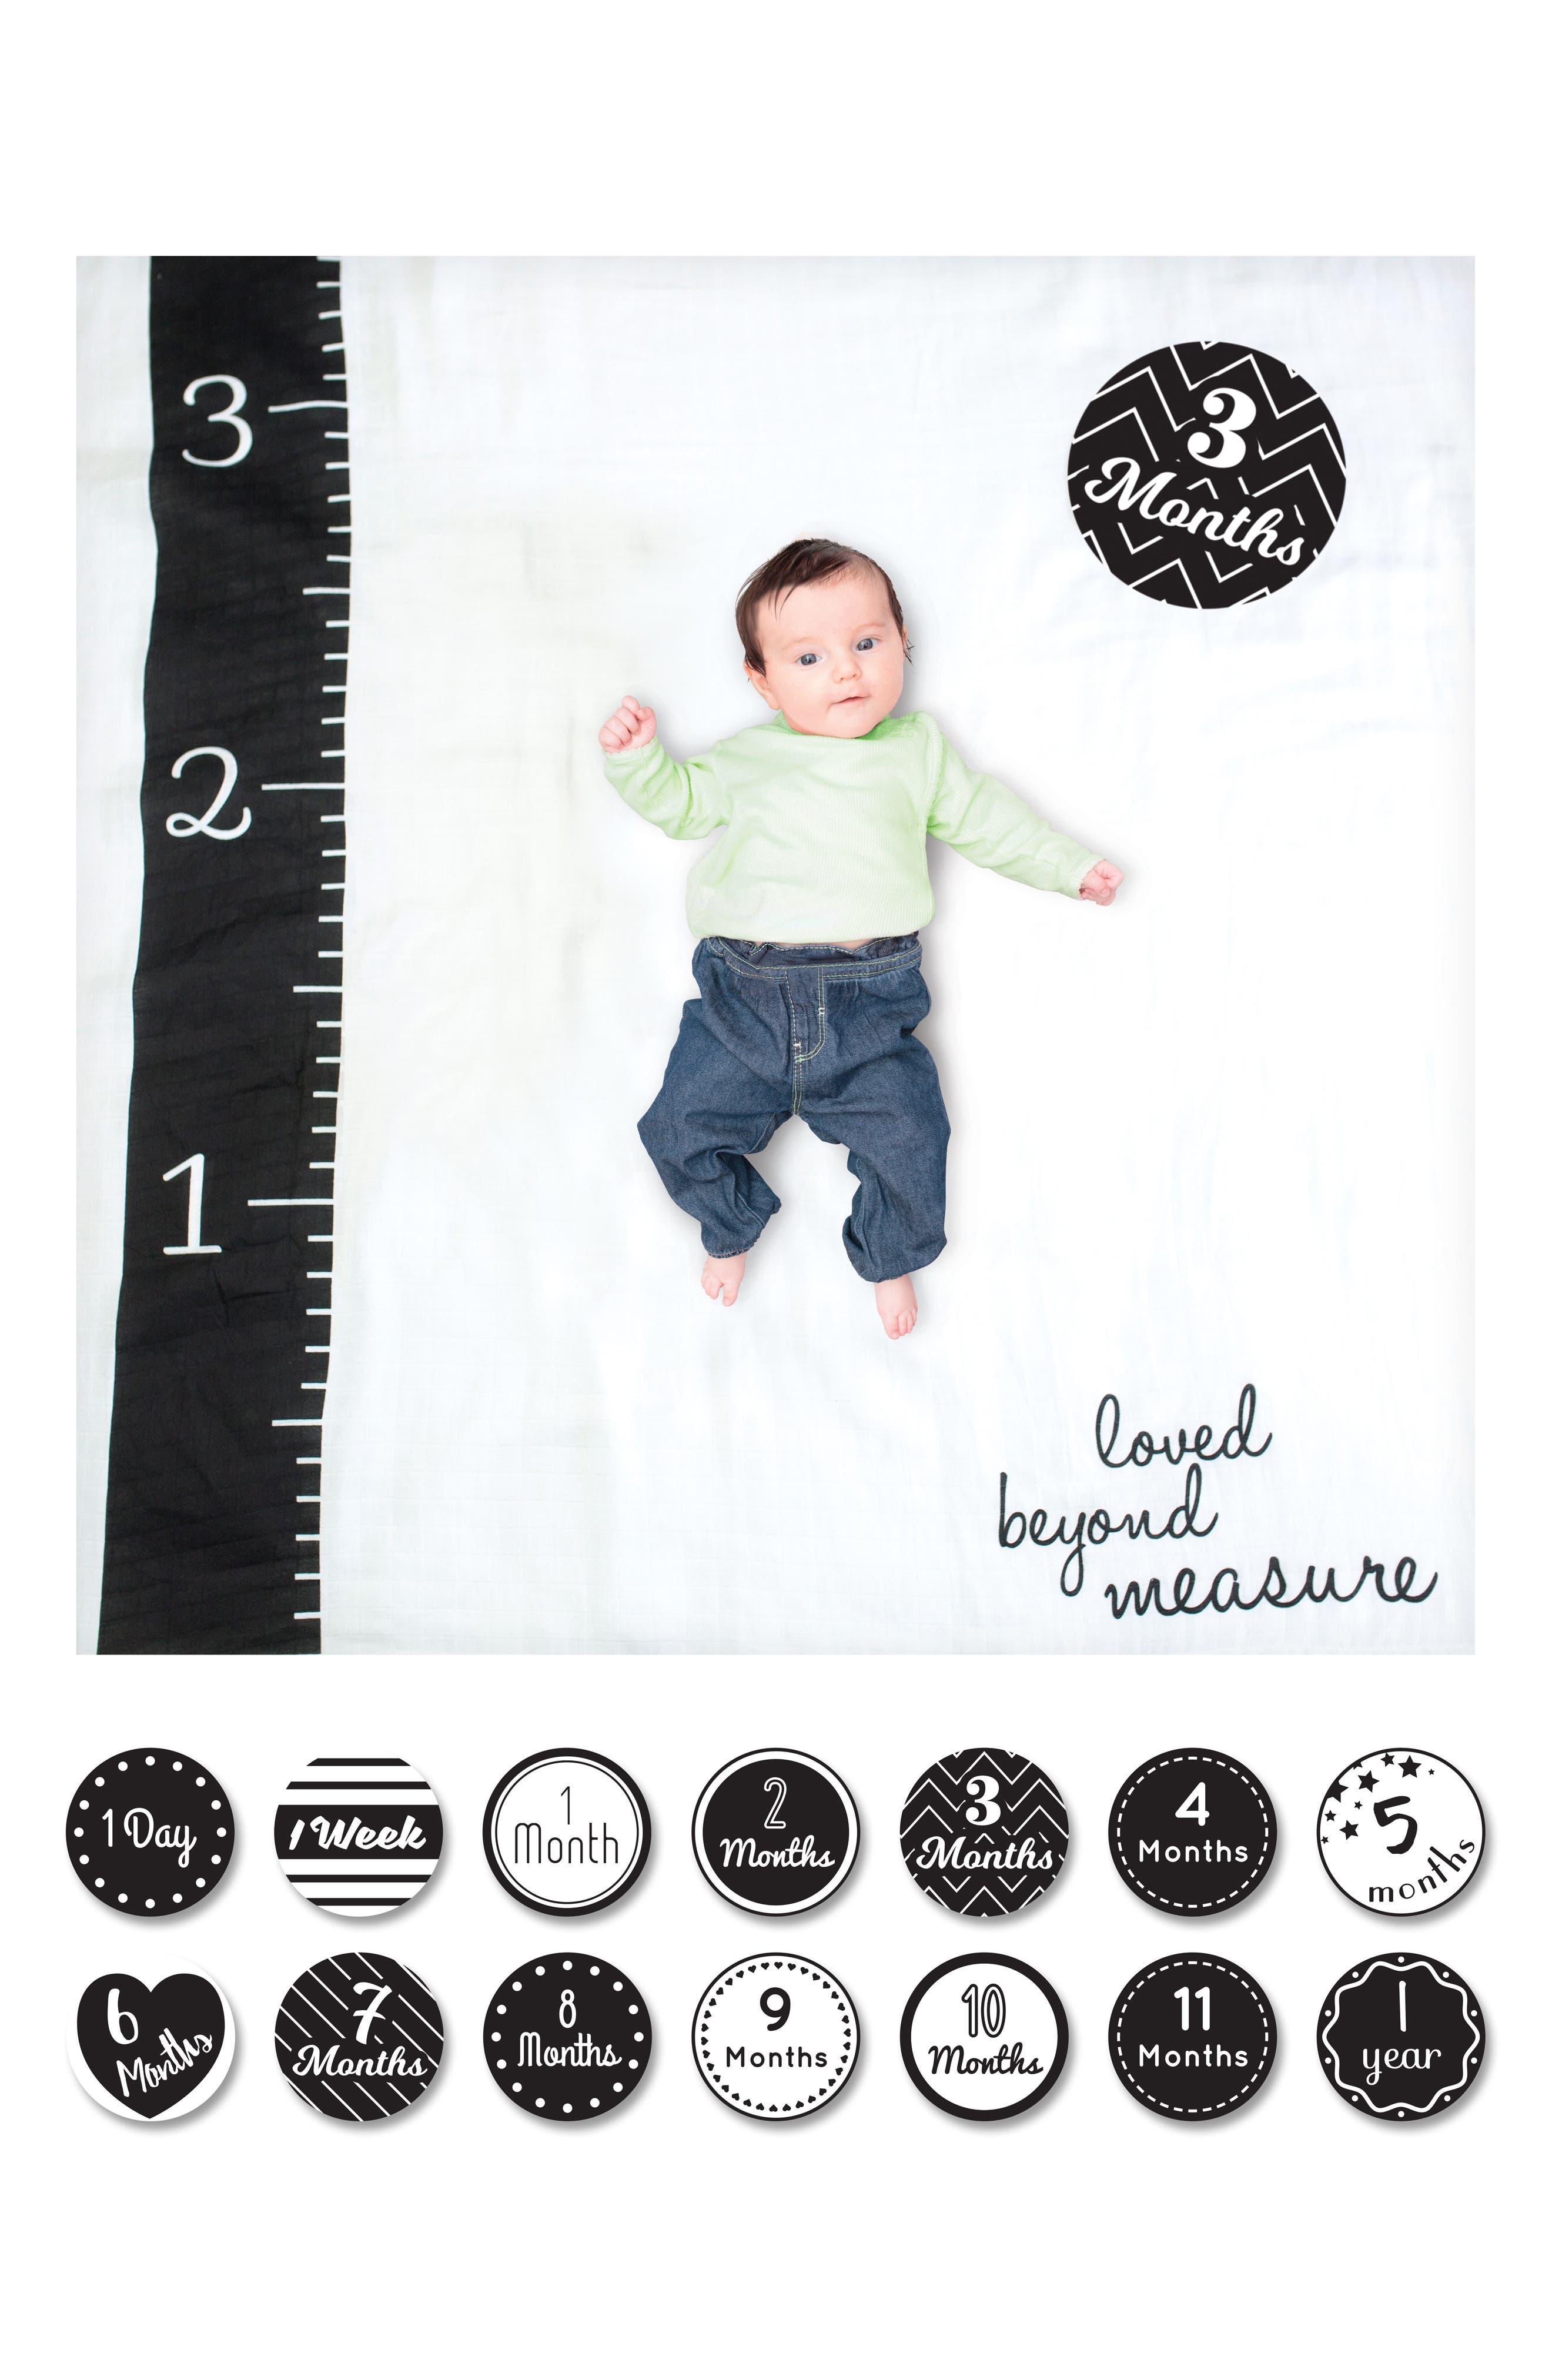 Baby's First Year - Loved Beyond Measure Muslin Blanket & Milestone Card Set,                             Alternate thumbnail 3, color,                             100